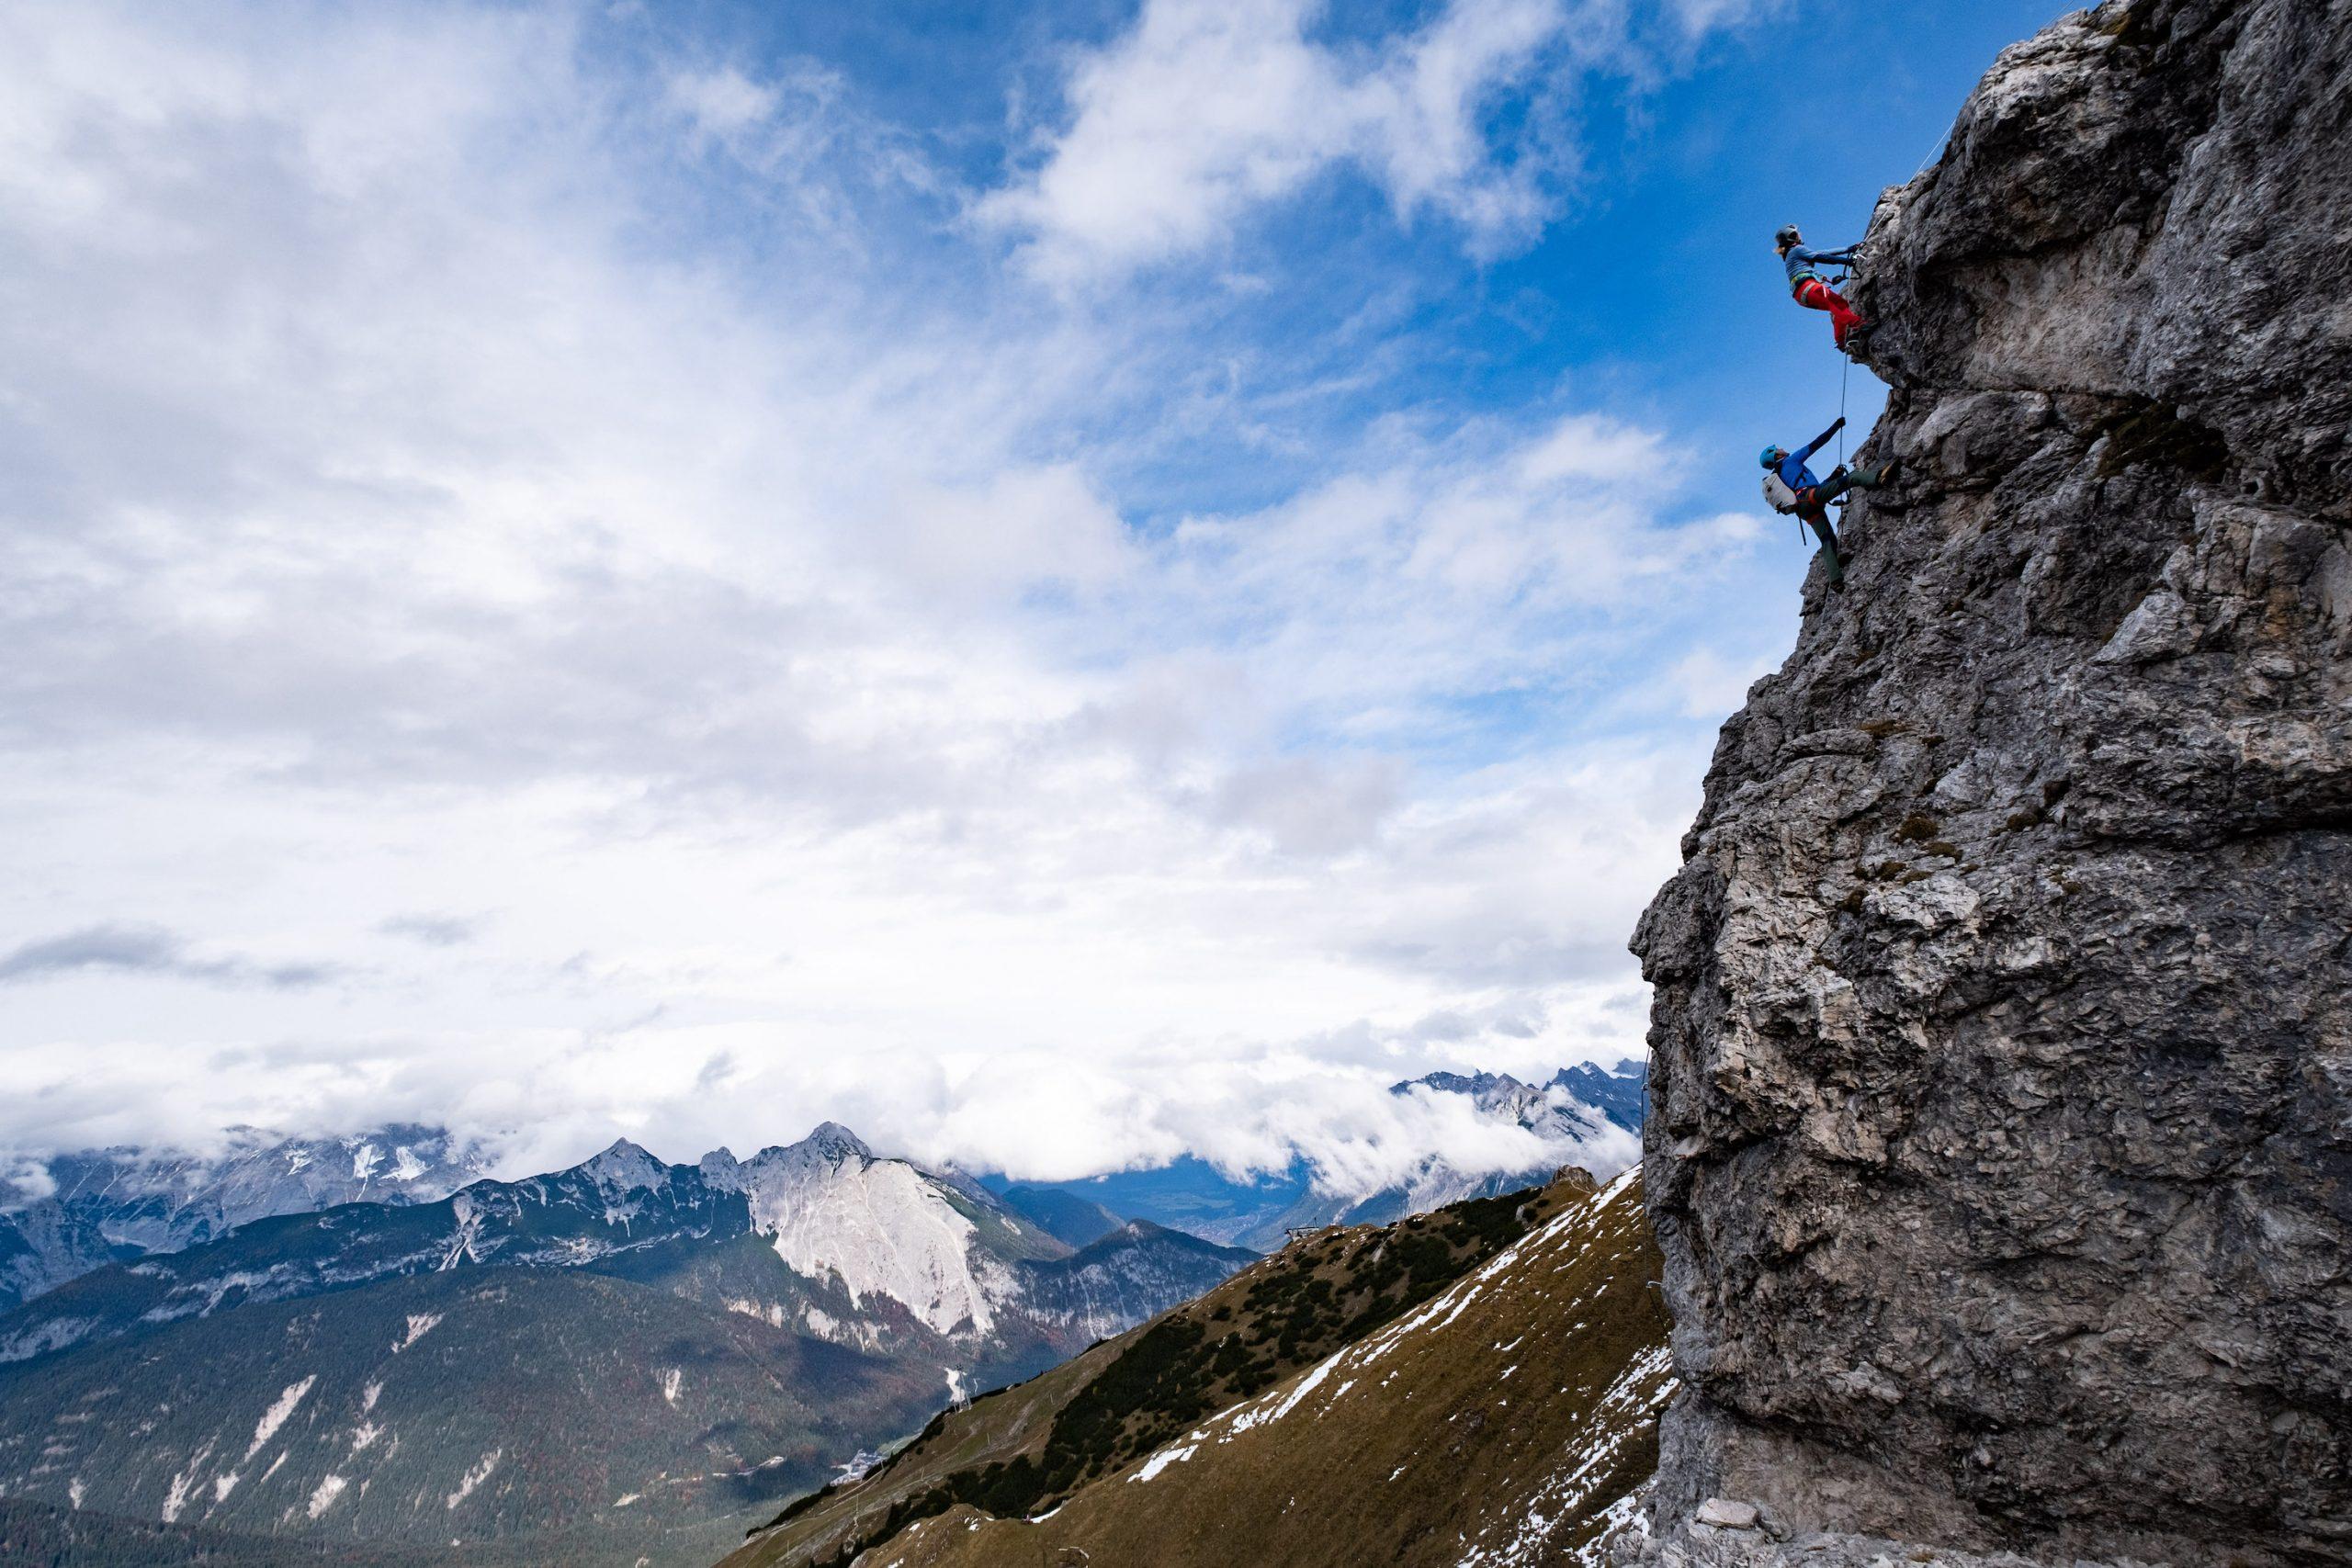 Aussicht am Seefelder Panorama-Klettersteig | Olympiaregion Seefeld - Johannes Mair/Alpsolut Pictures